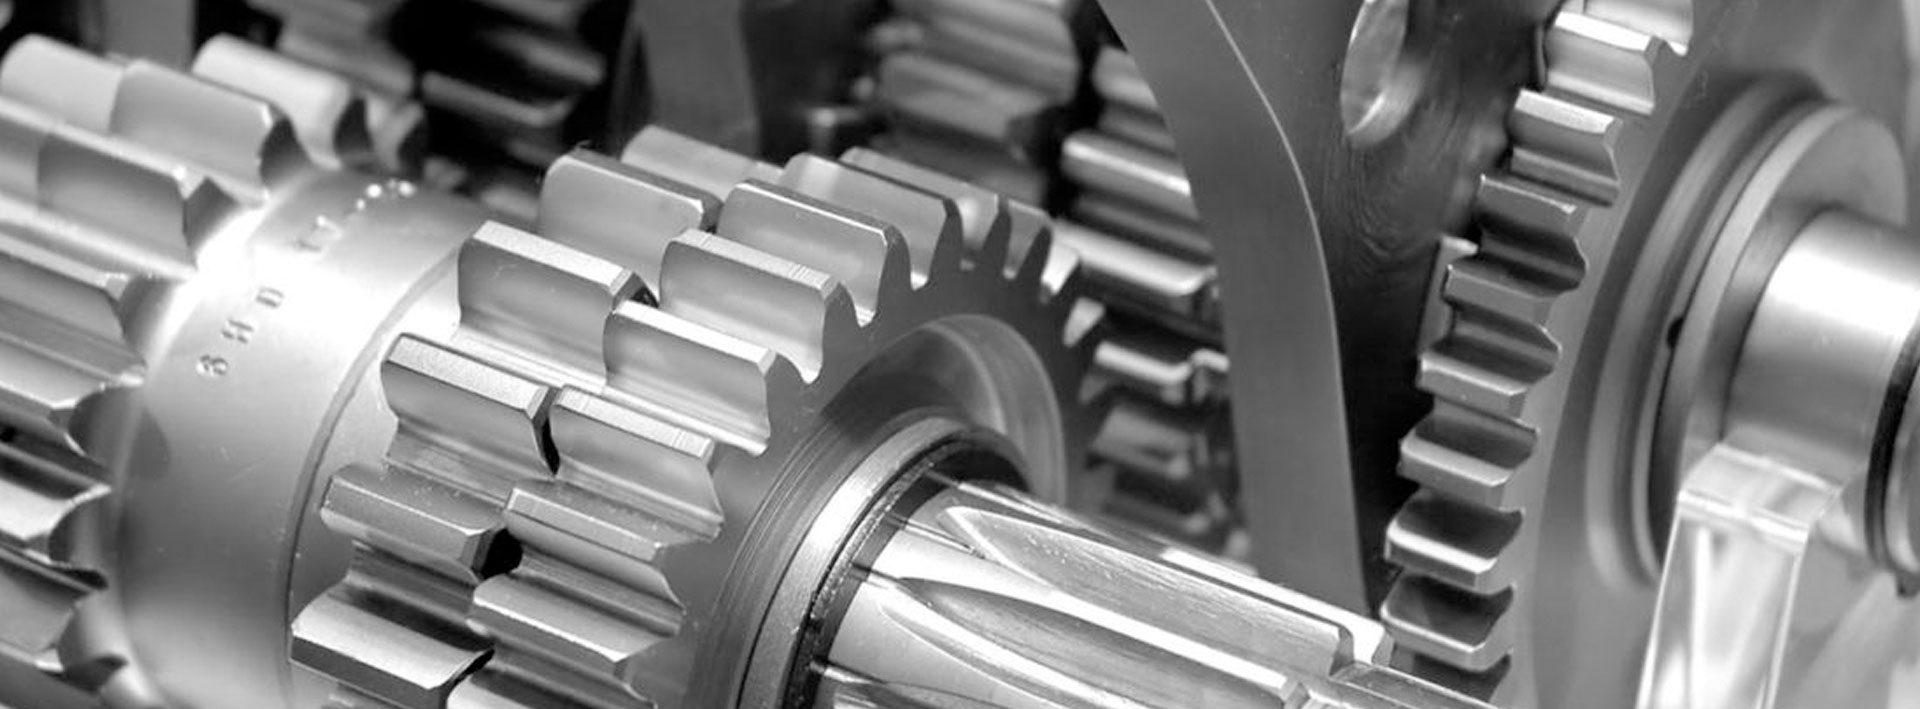 Dunimex - Produção Industrial